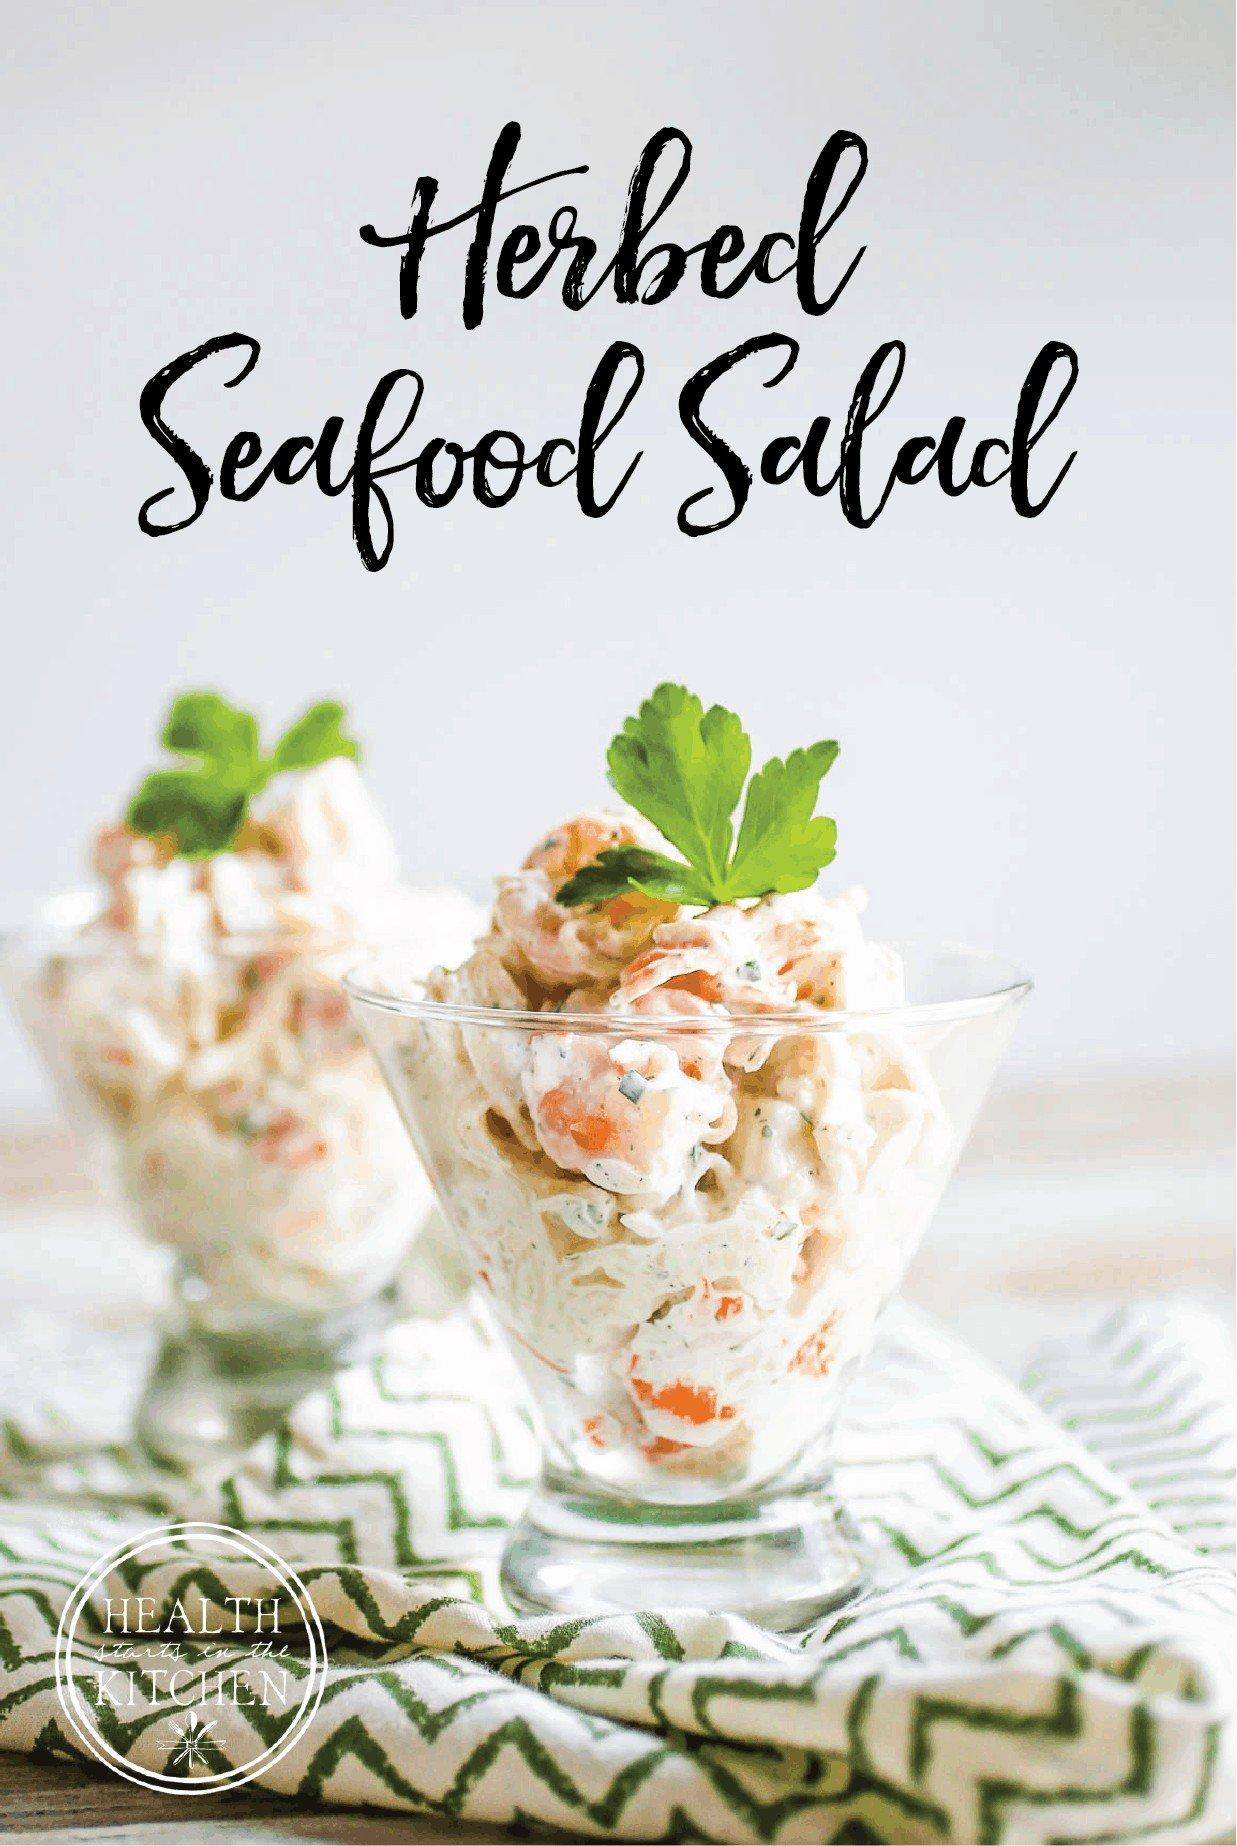 Gluten-Free Herbed Seafood Salad